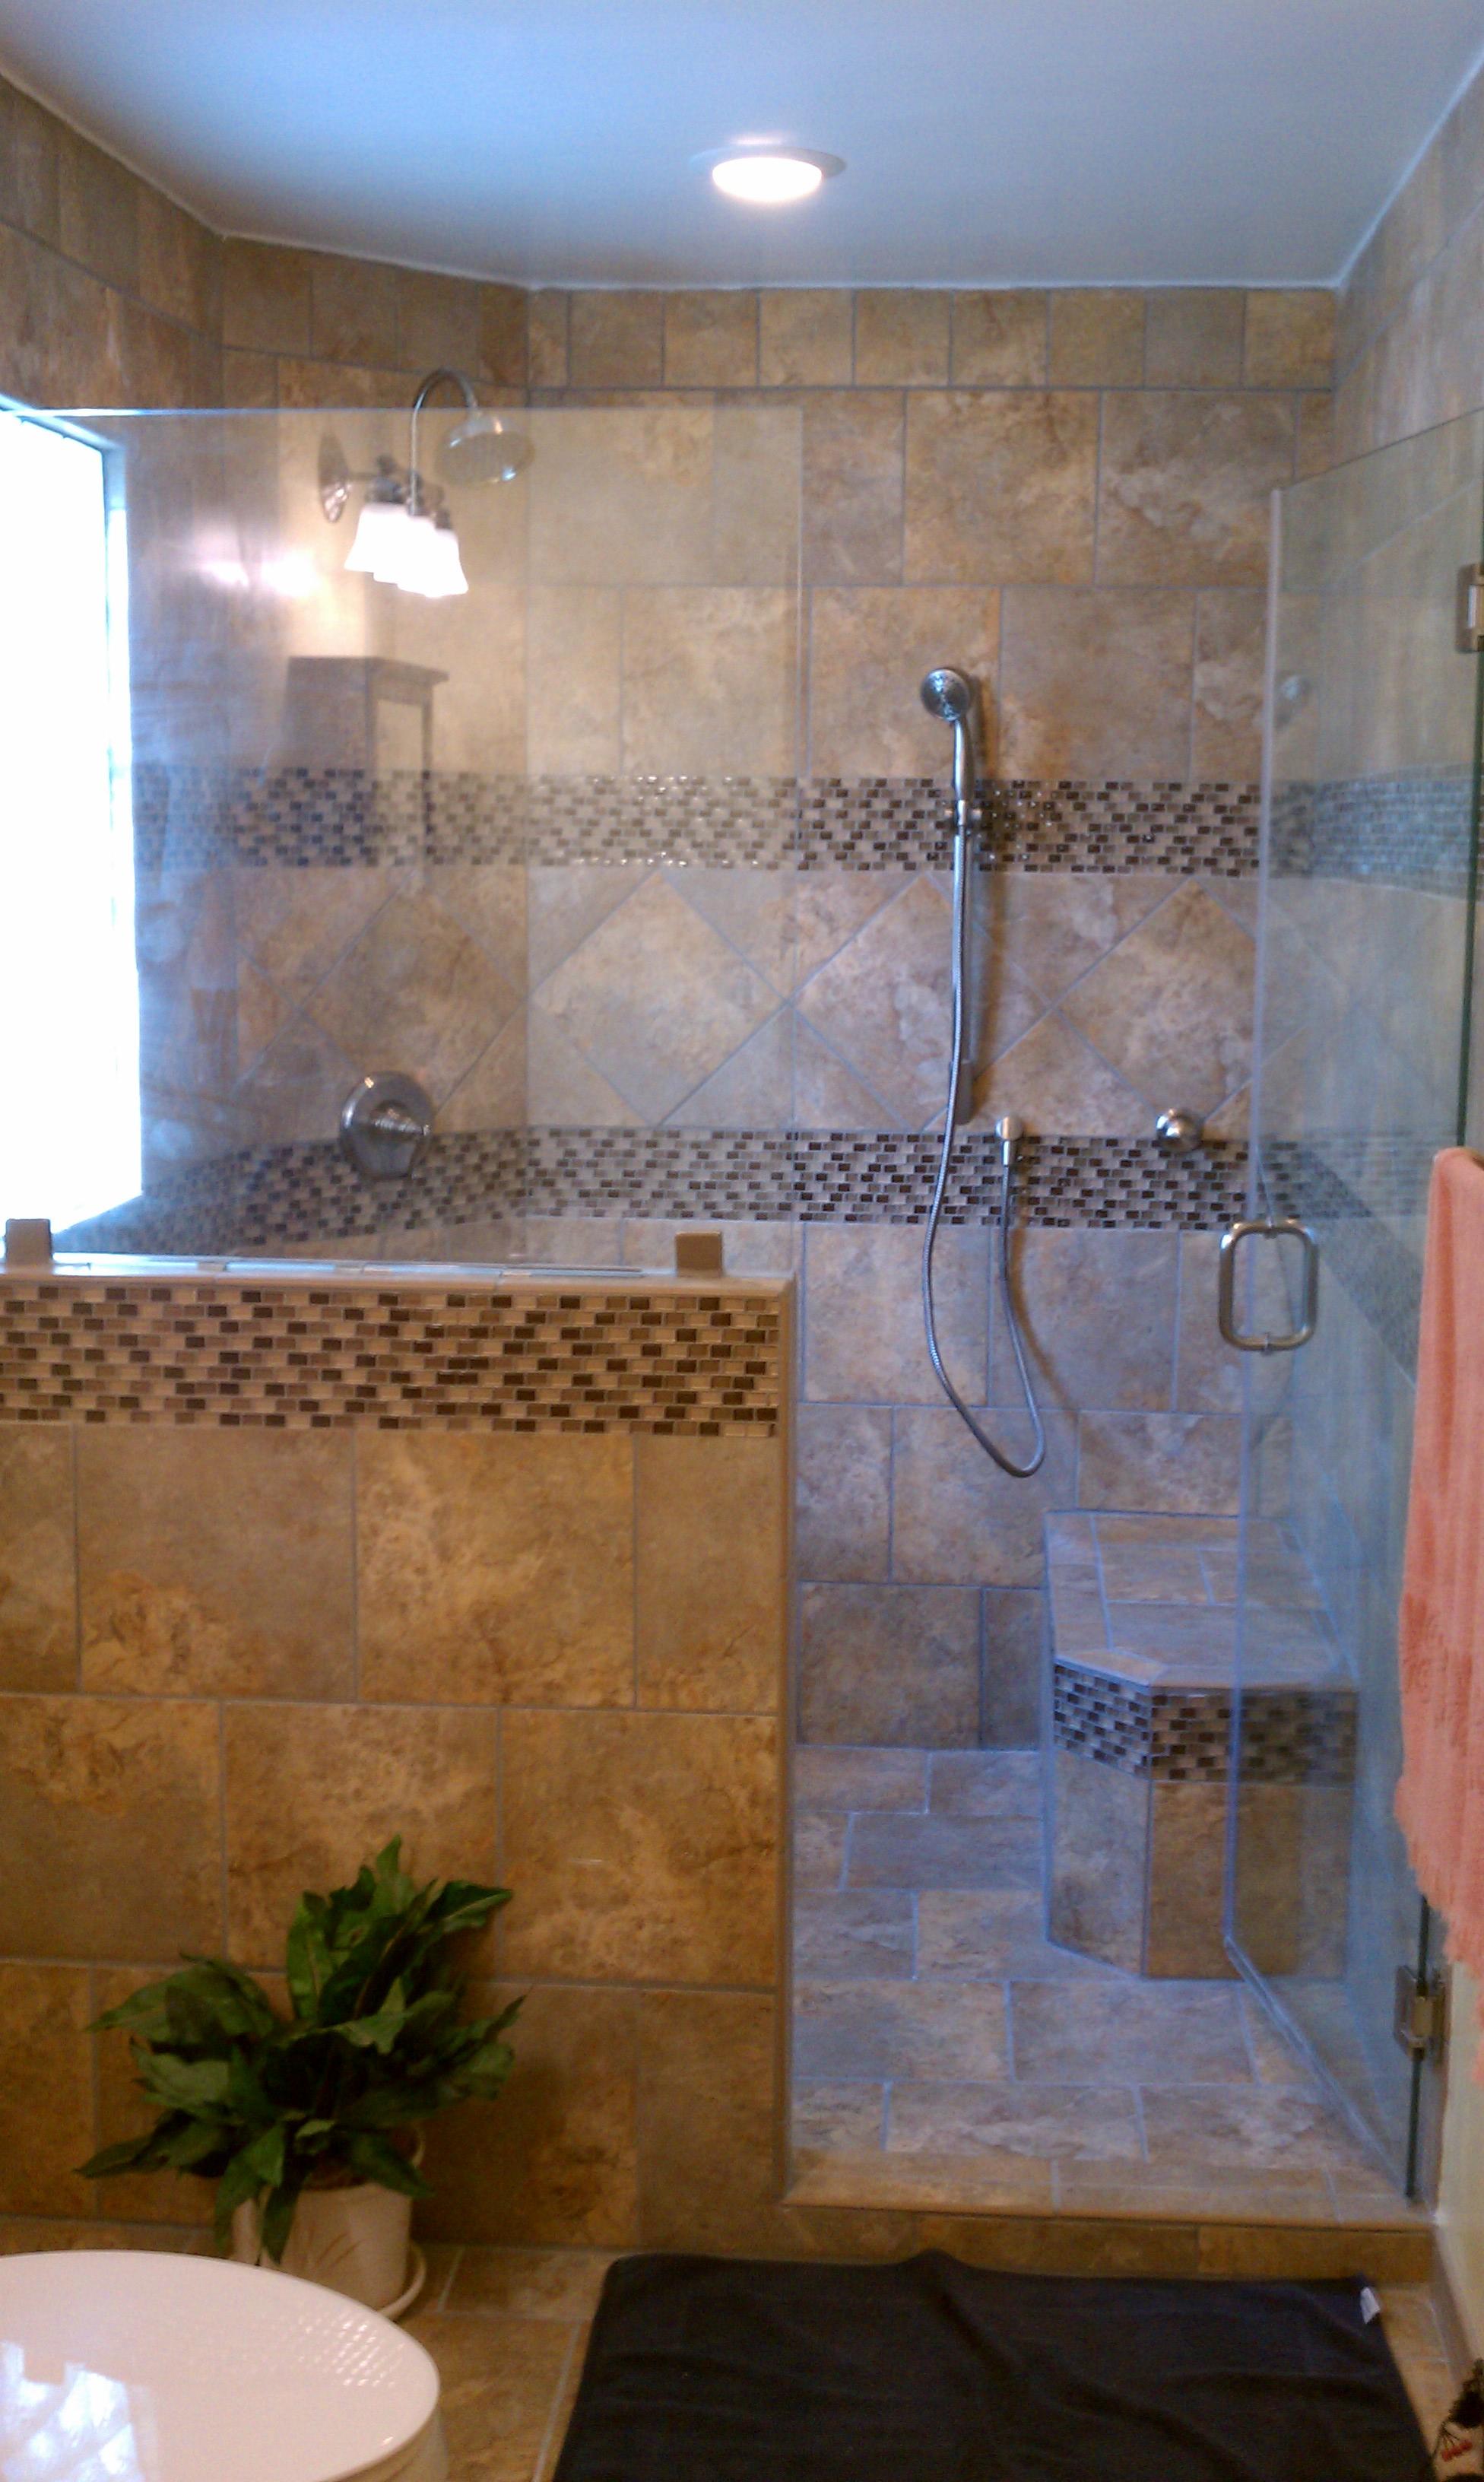 Shower Curtain Vs Shower Door Page 4 Babycenter